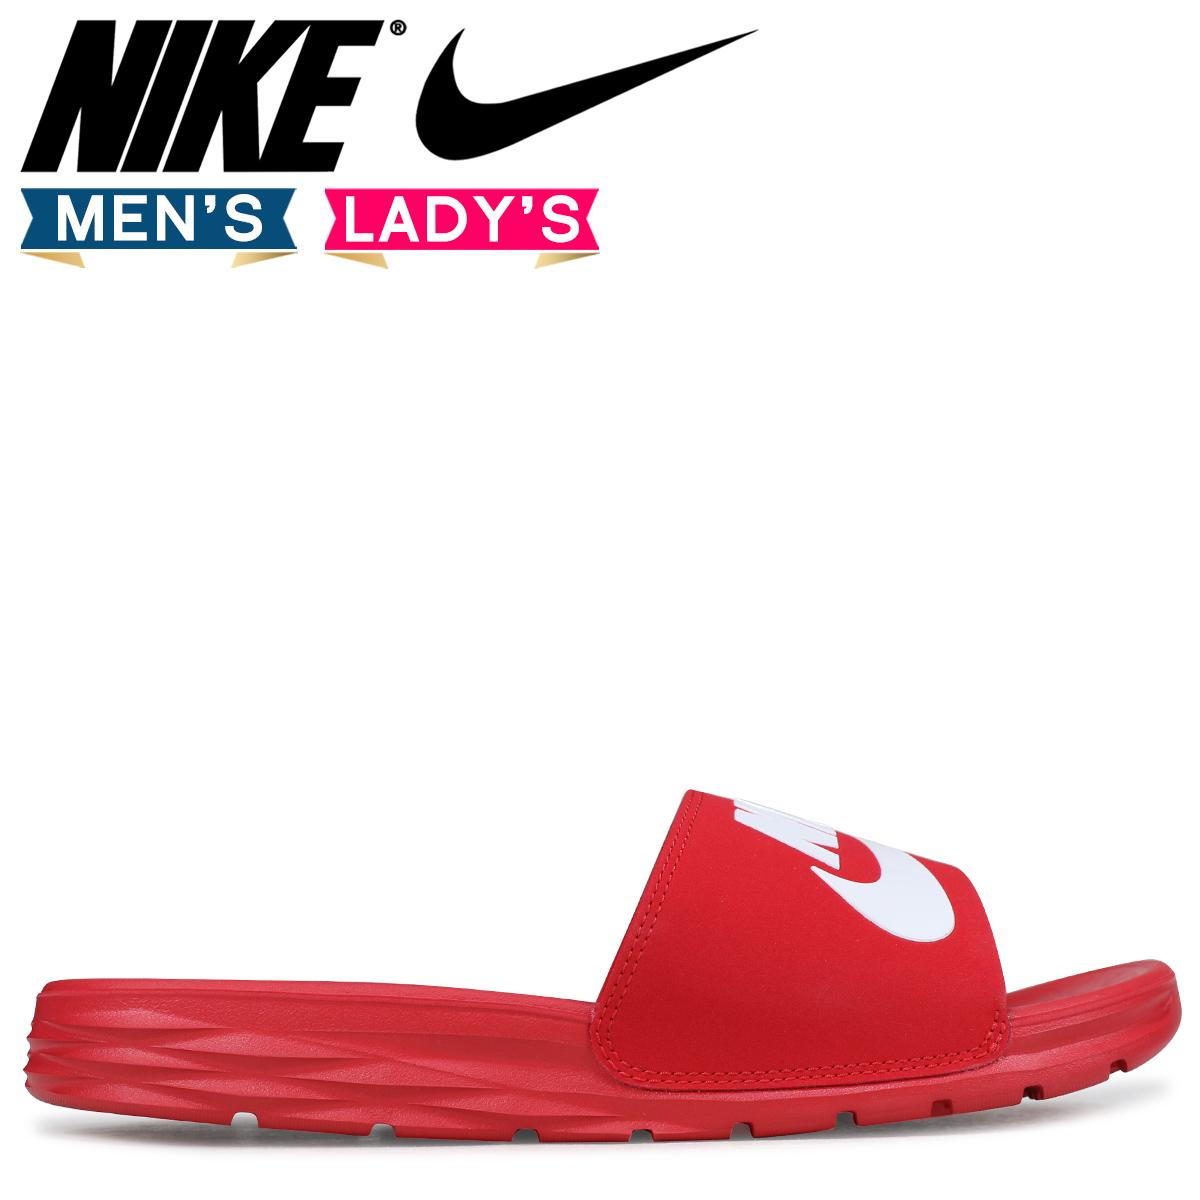 size 40 50972 d48b7 NIKE Nike SB サンダルベナッシシャワーサンダルスポーツメンズレディース BENASSI SOLARSOFT SLIDE  840,067-601 ...